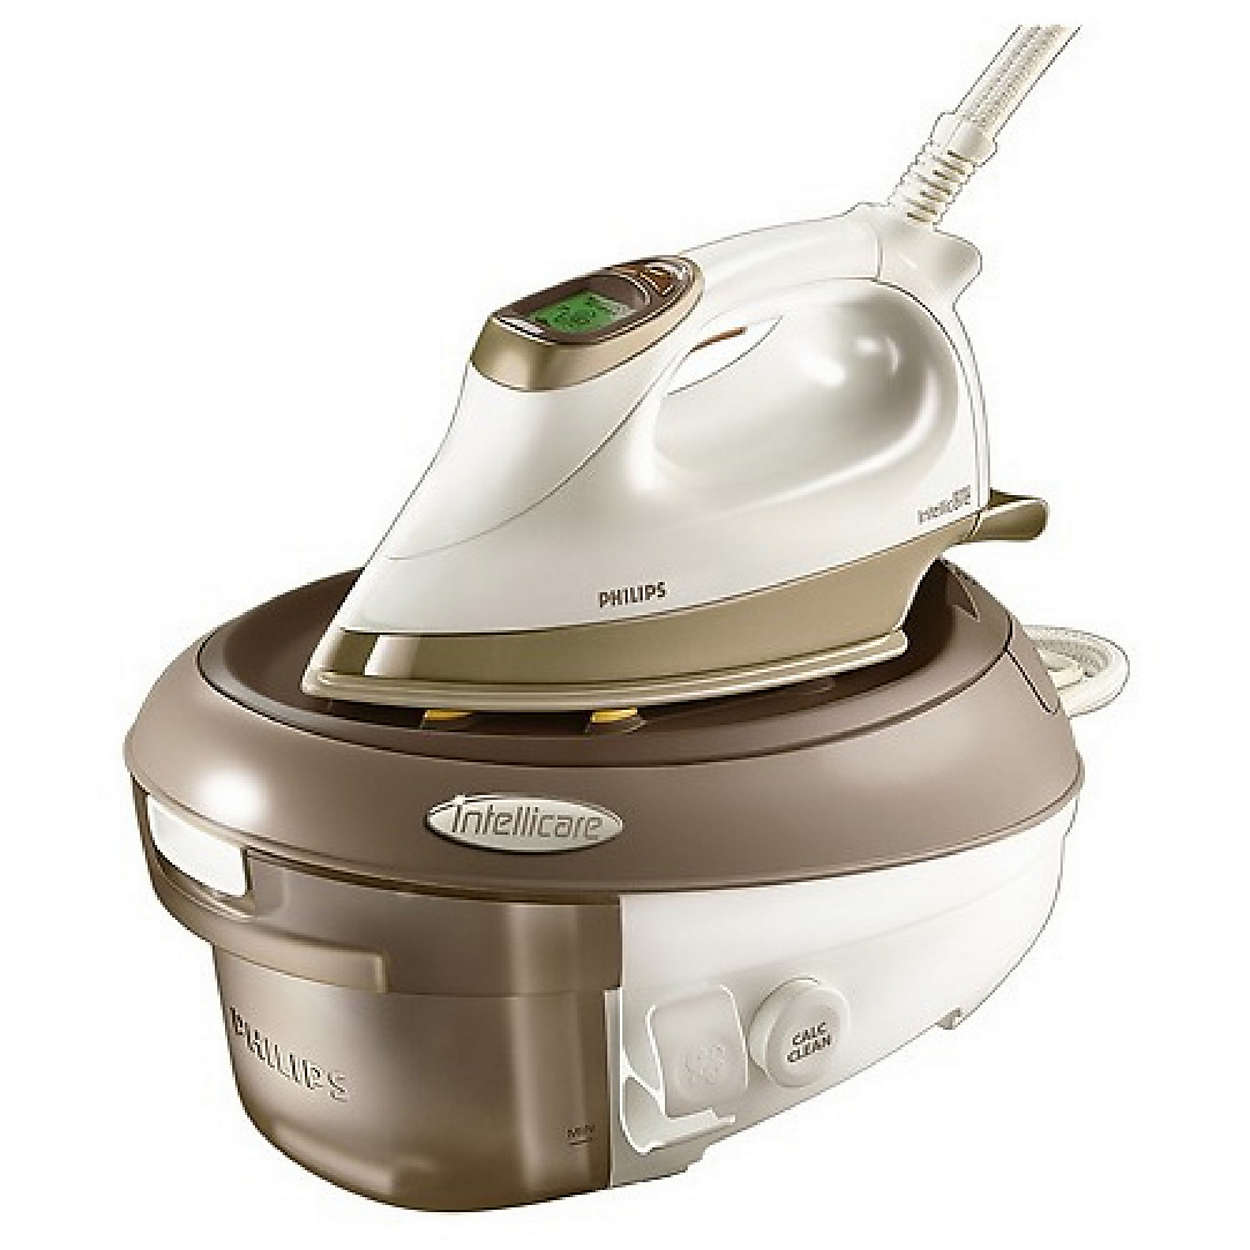 Kraftig stryking med damp med trykk